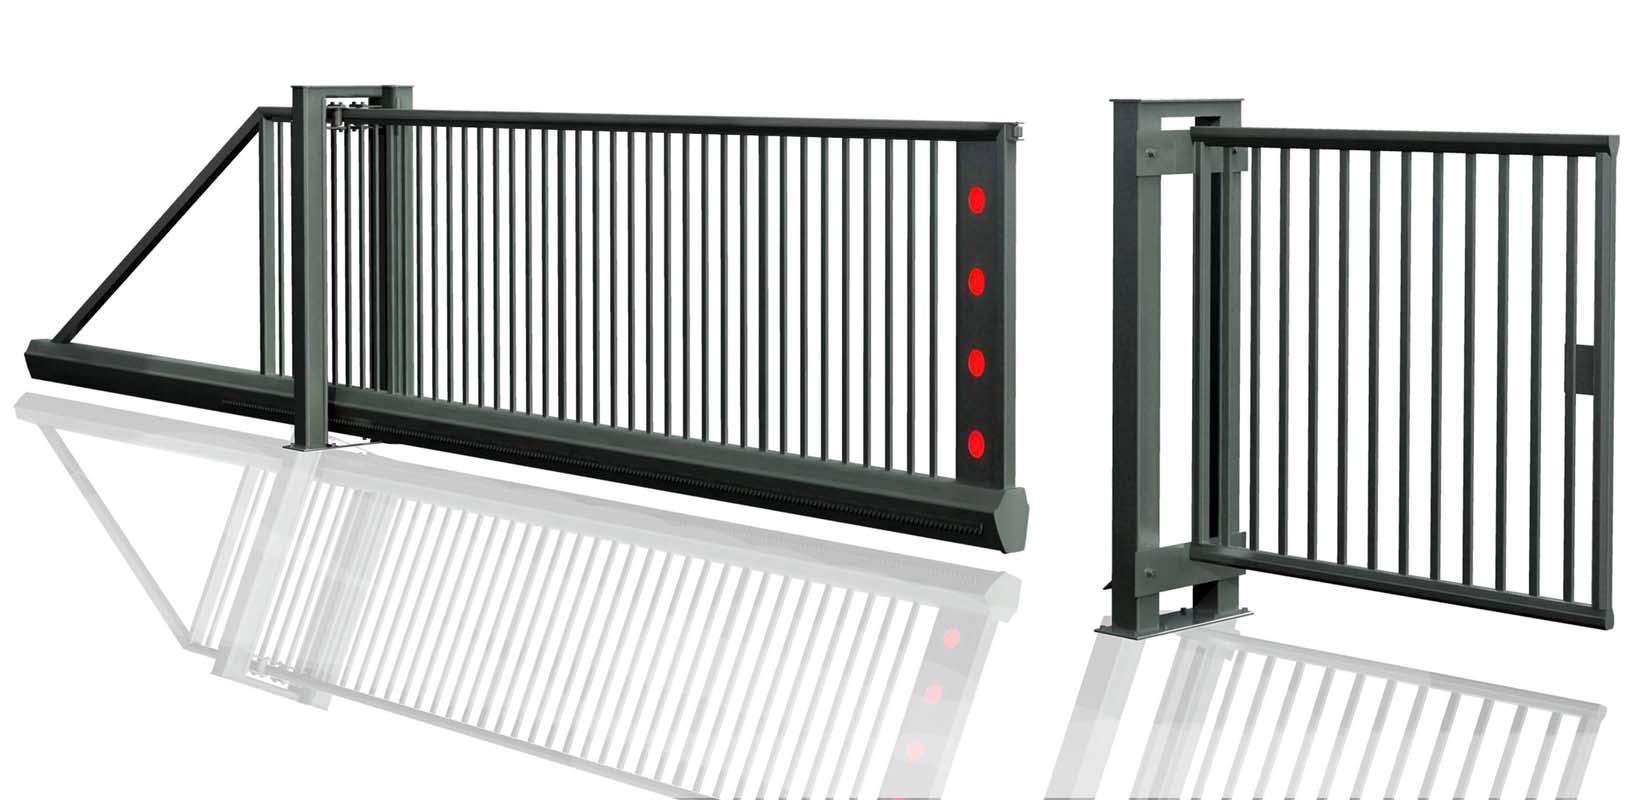 Sliding Gates 3 Tps Gates Amp Doors Ltd Electric Gates